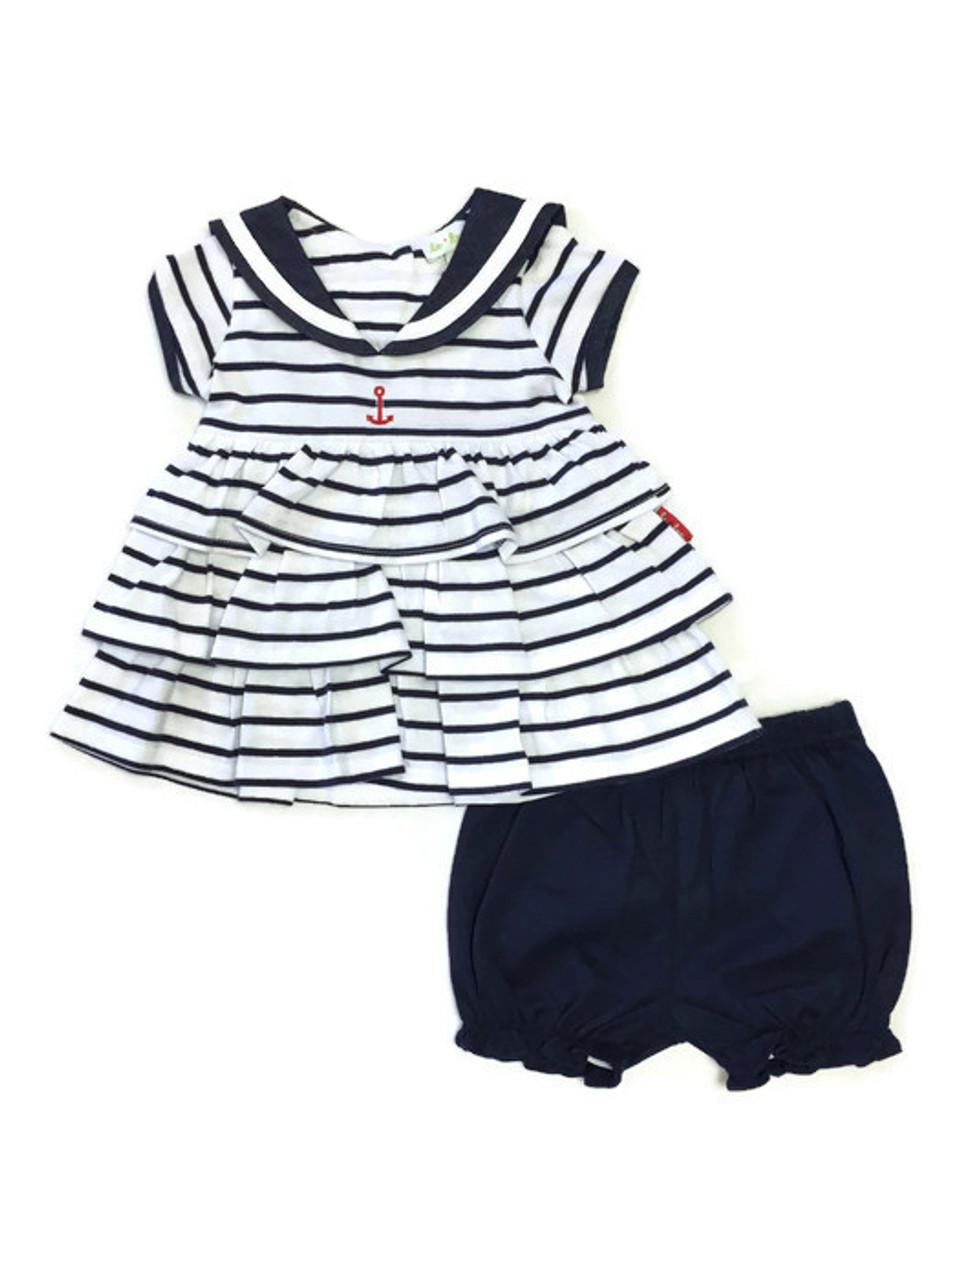 cb84a8f17 Le Top Baby Girl Navy Stripes Nautical Dress   Berri Kids Resale Boutique